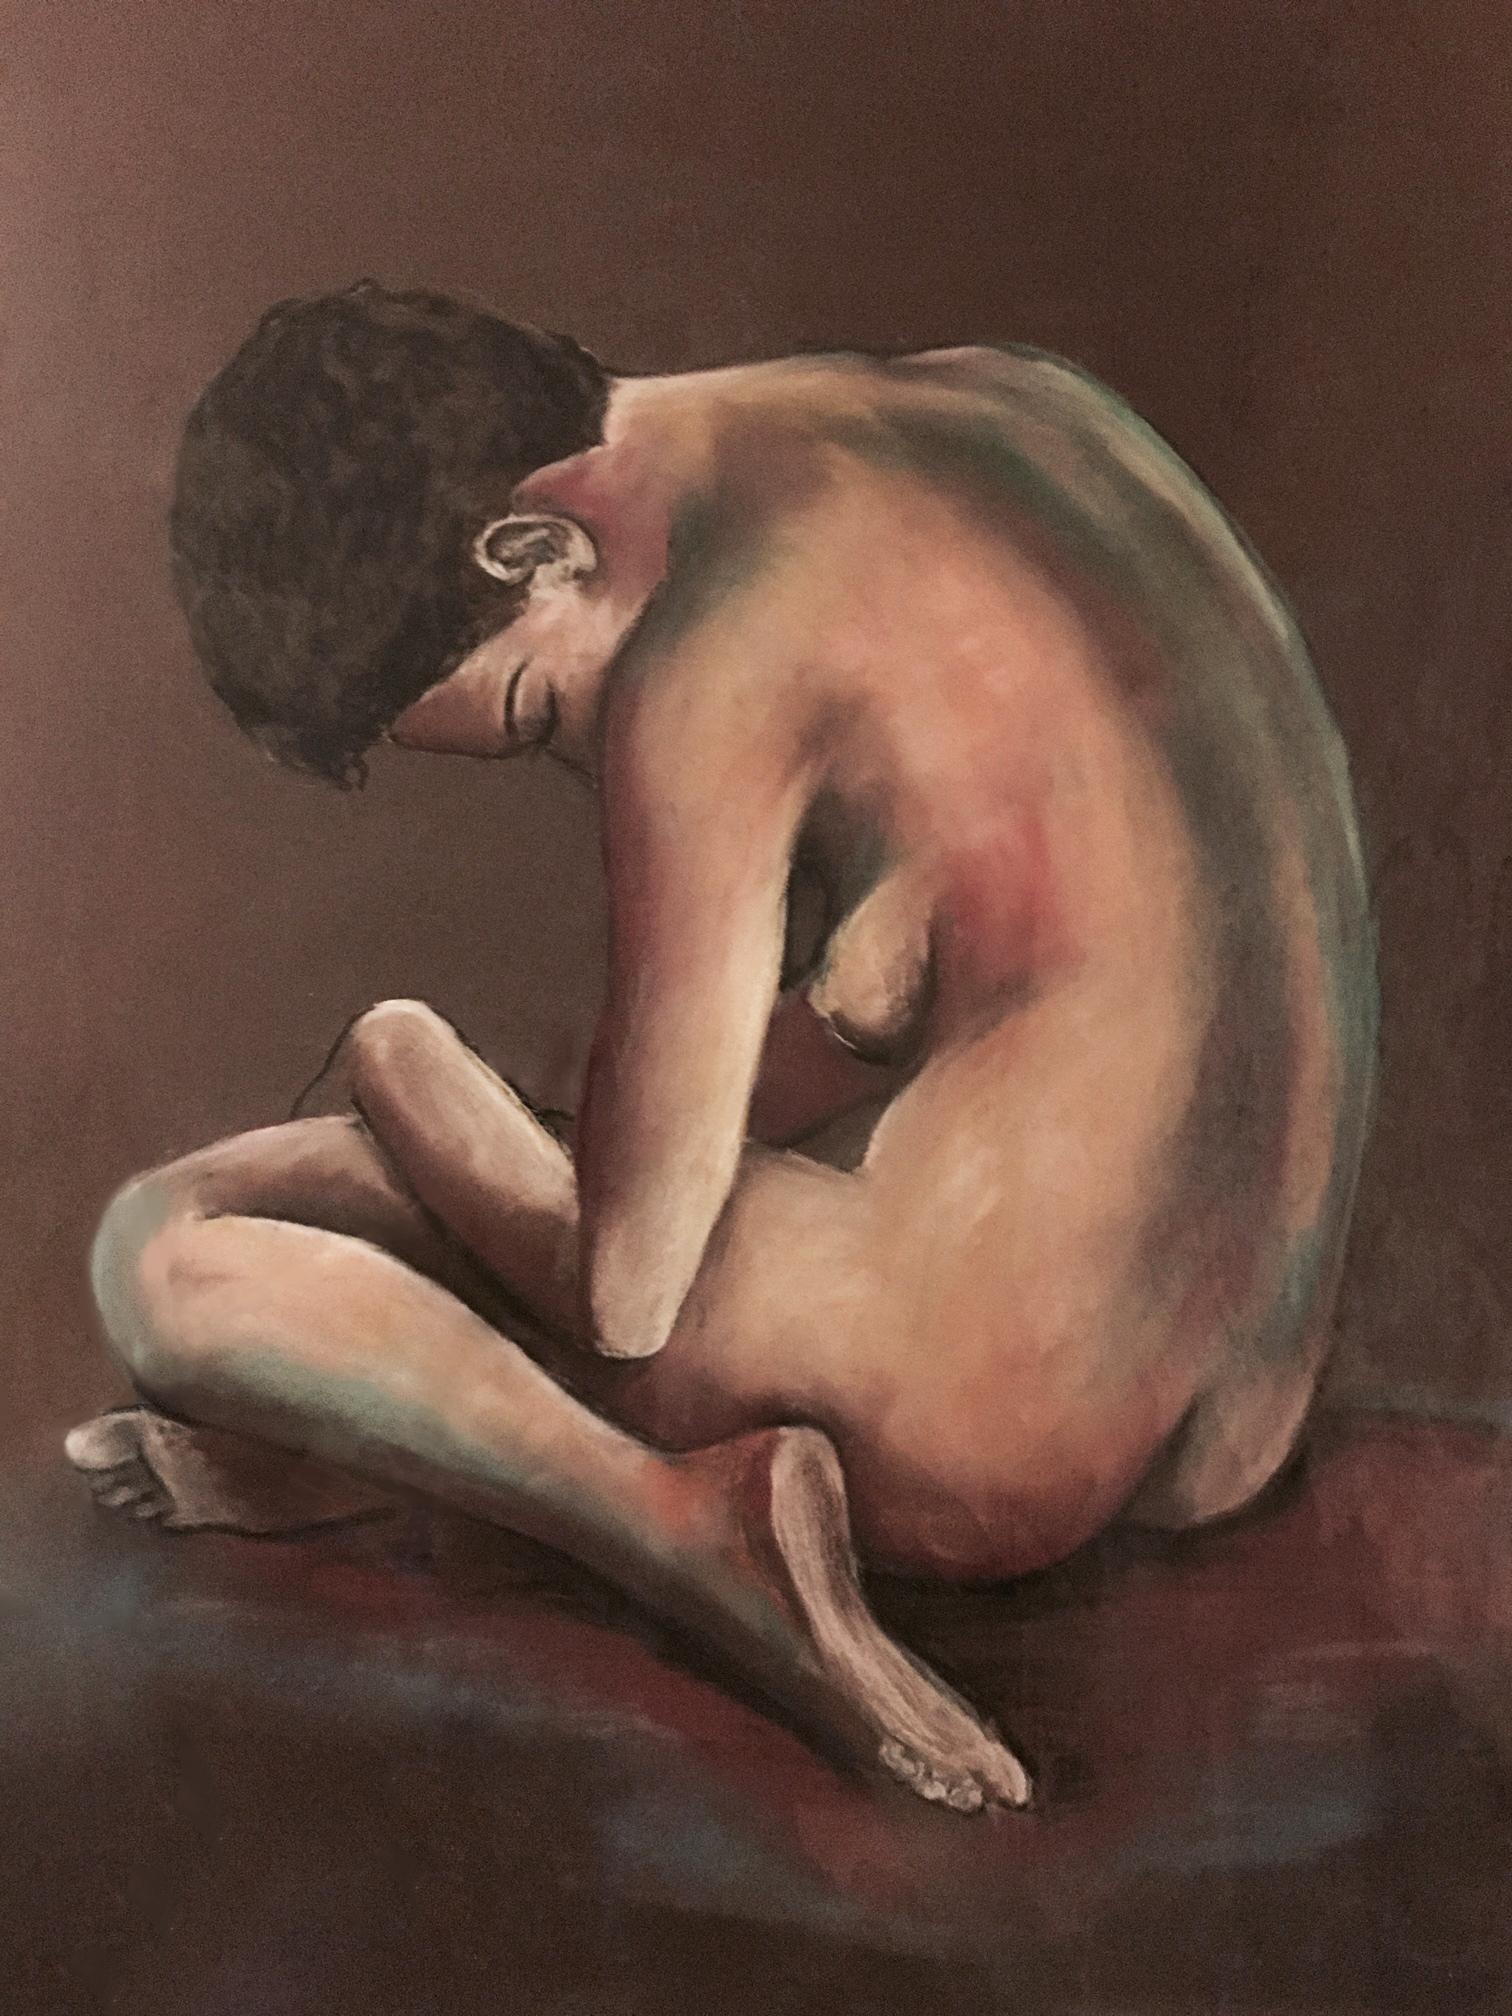 21 - Exploited Vertebra by Tara Boirard